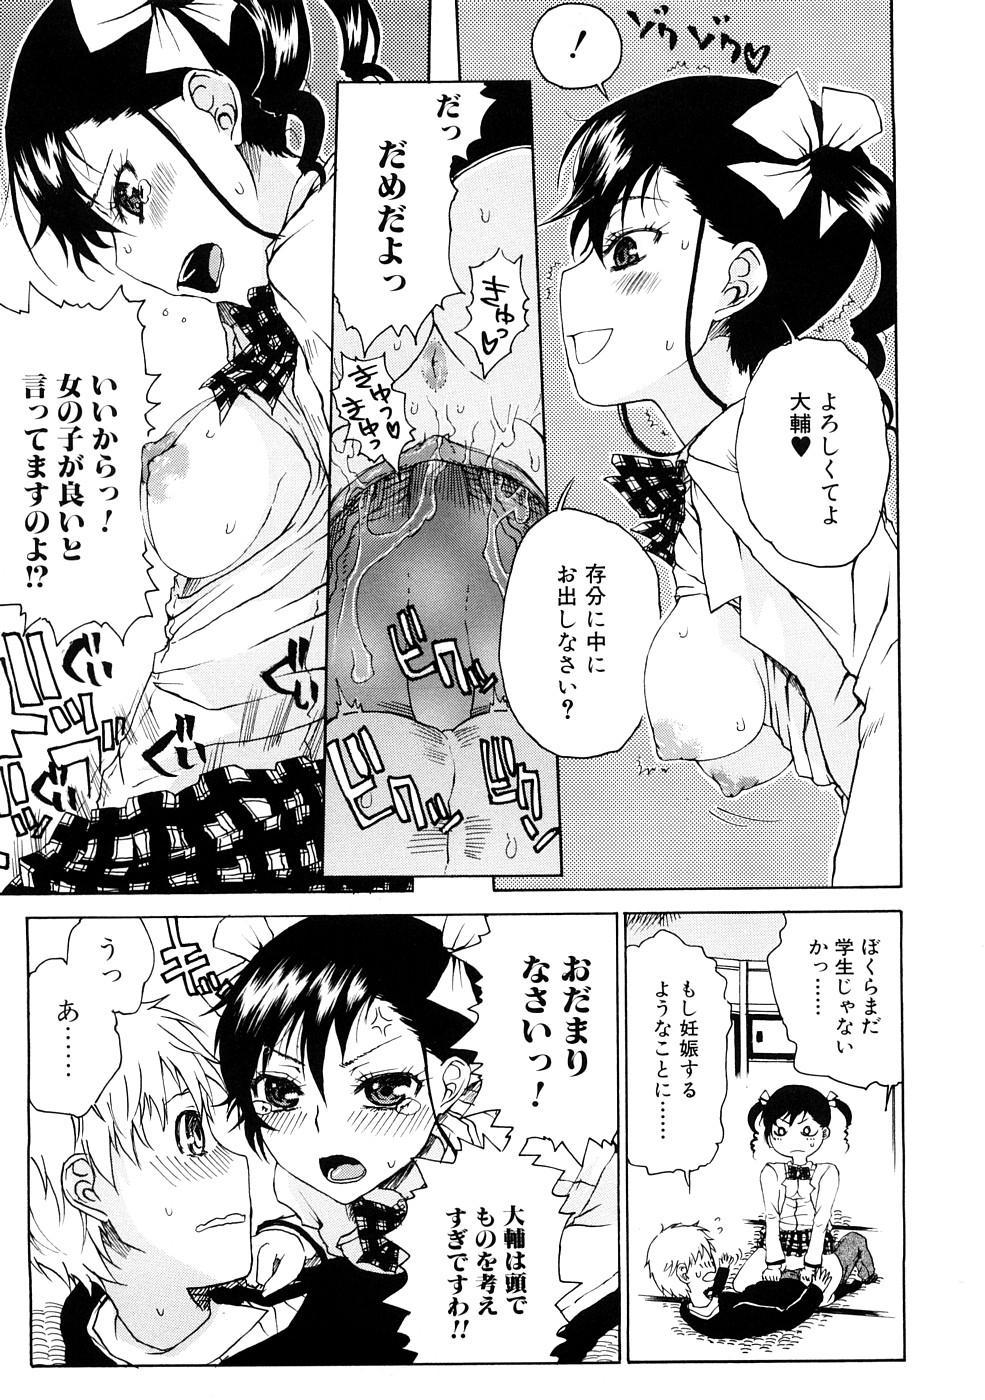 Ecchi de Jibunkatte de Kawaii Ko 46